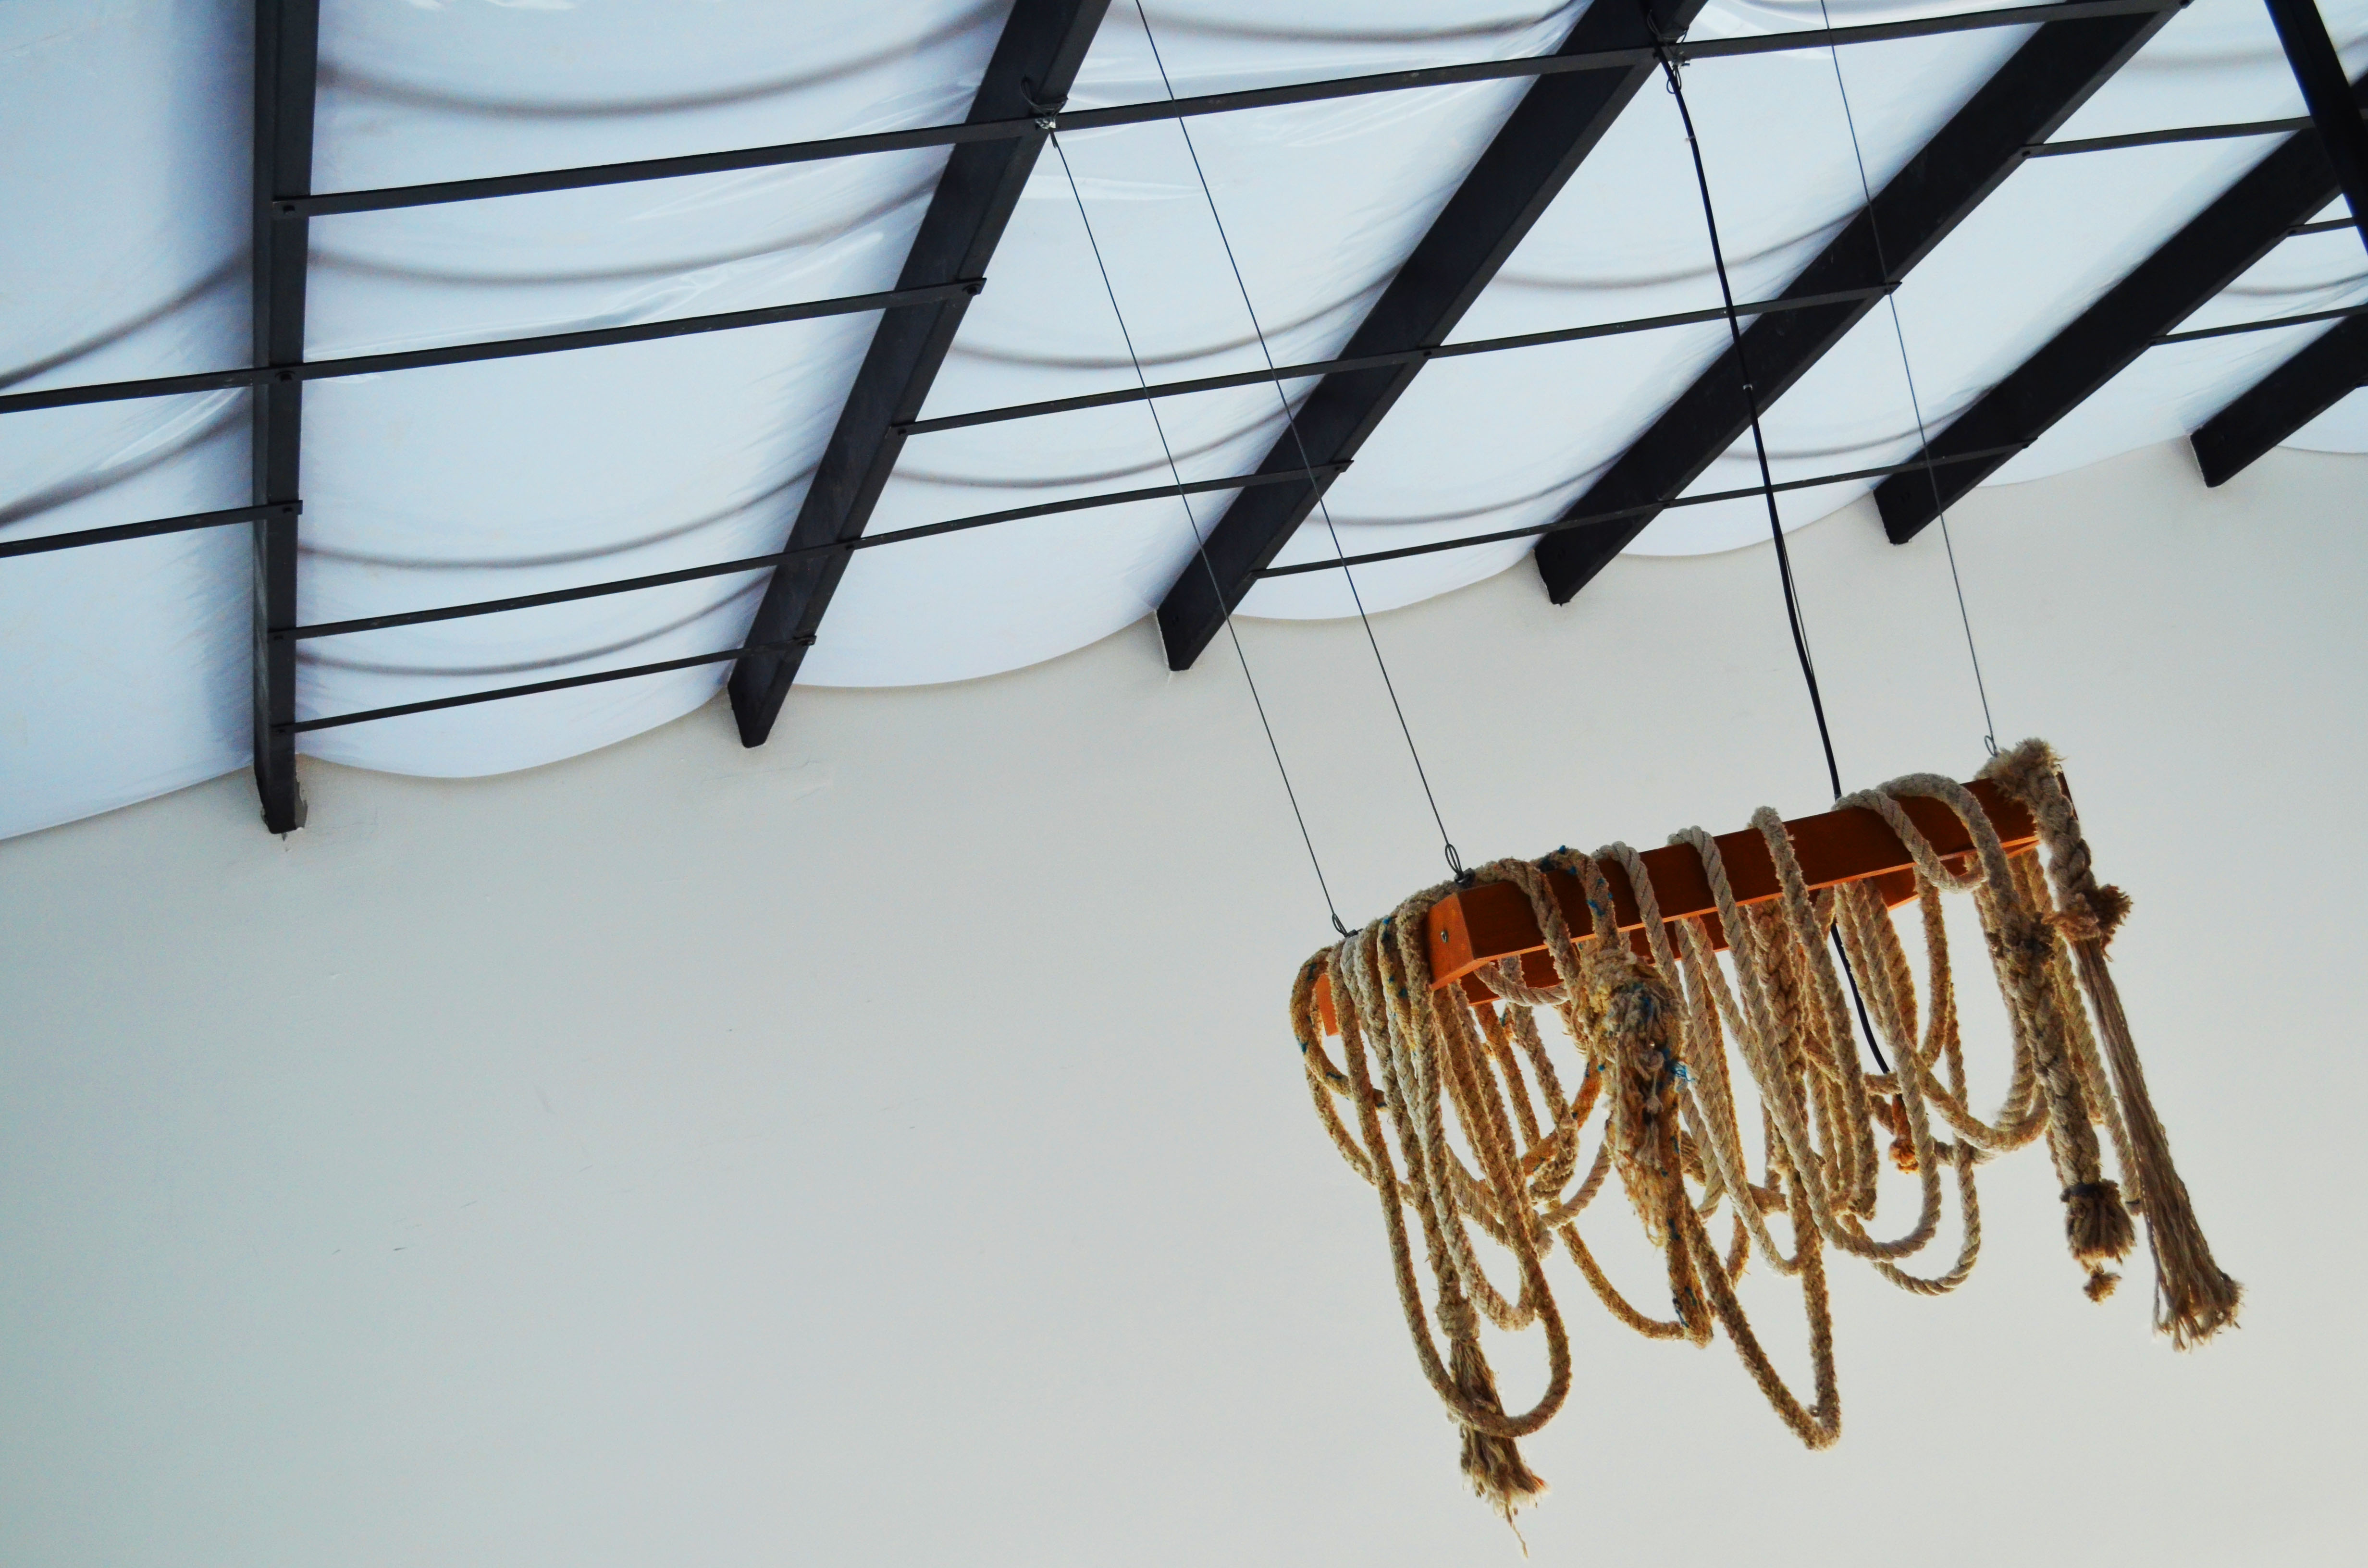 Muelle Kay Restaurant by Workshop 09